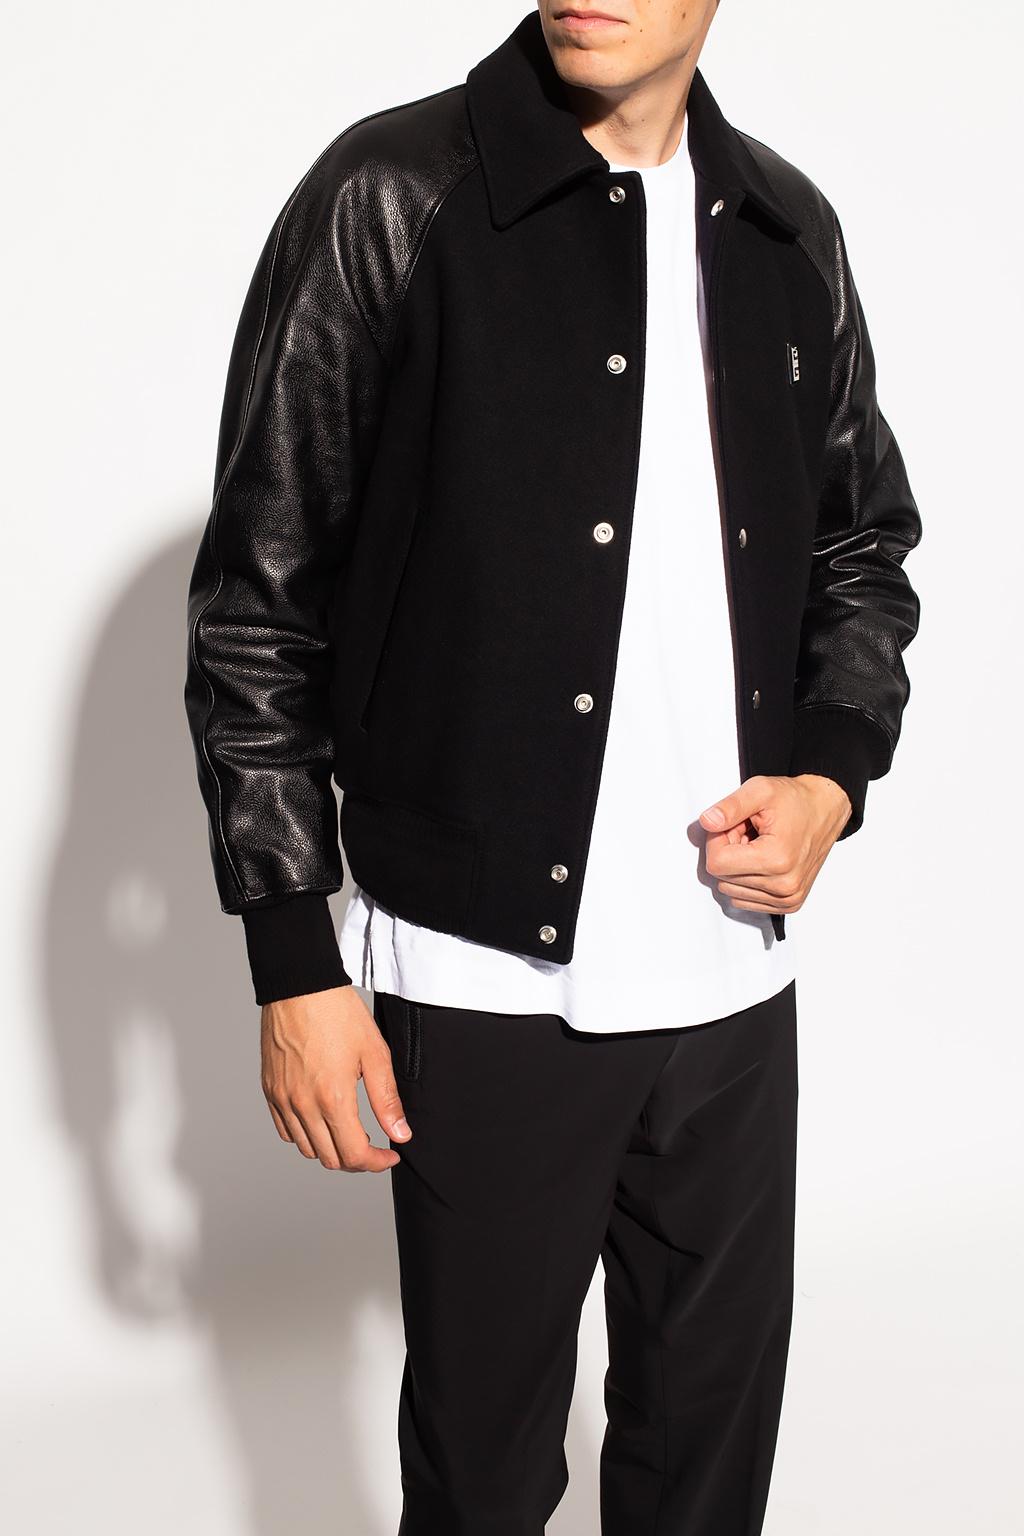 Givenchy Jacket with logo